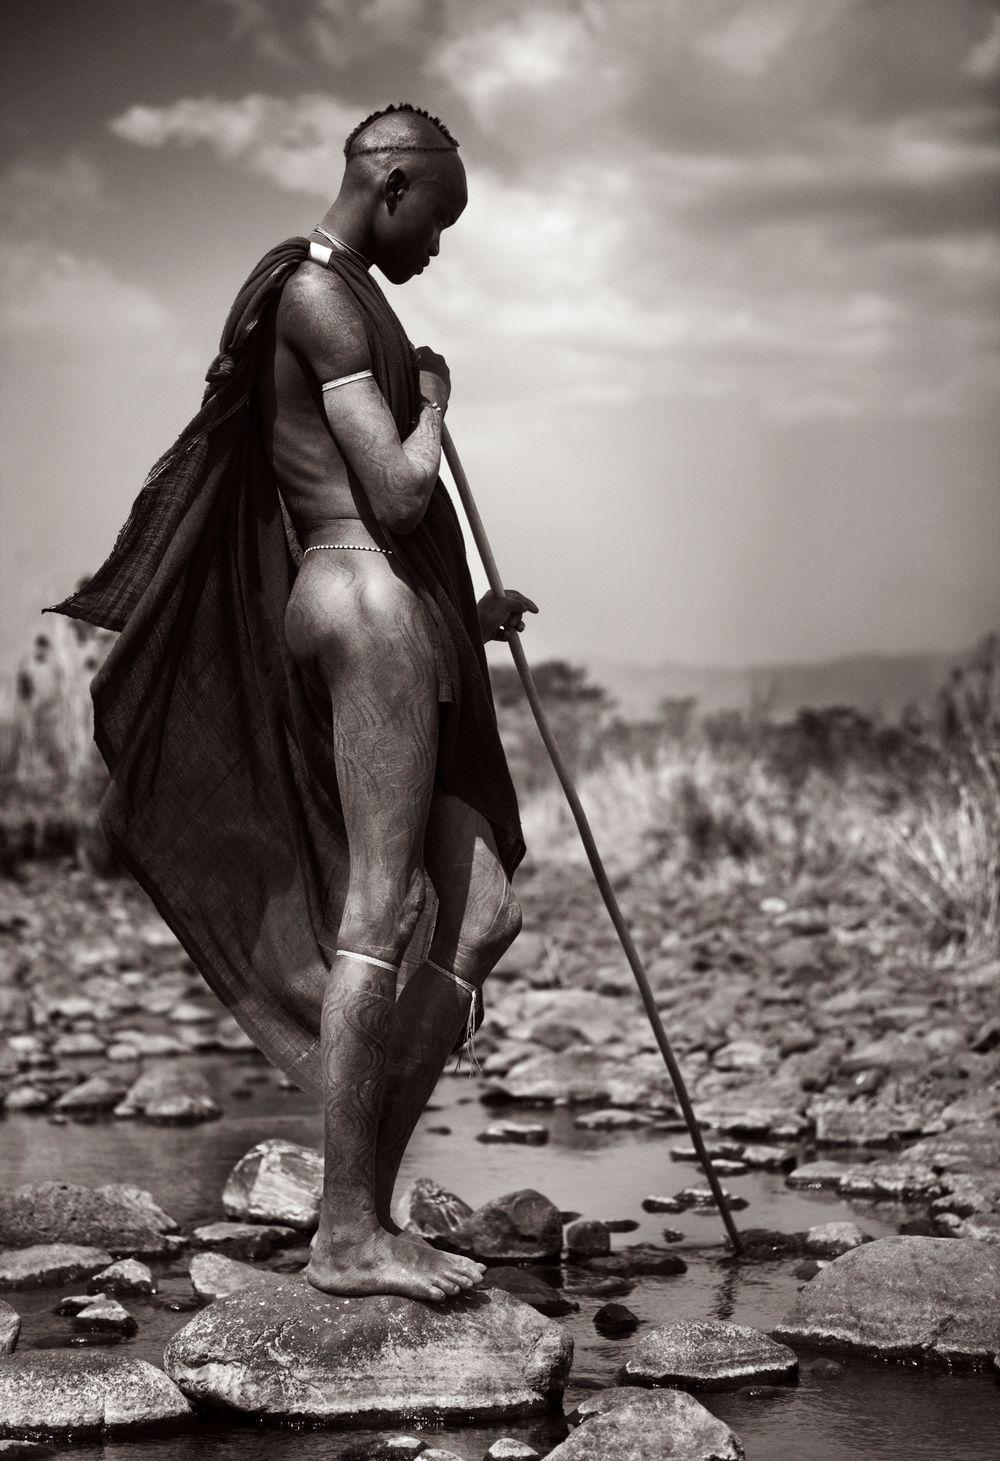 Omo-People-Drew-Doggett-africa-tribe-man-warrior-staff-river-Untitled-18.jpg